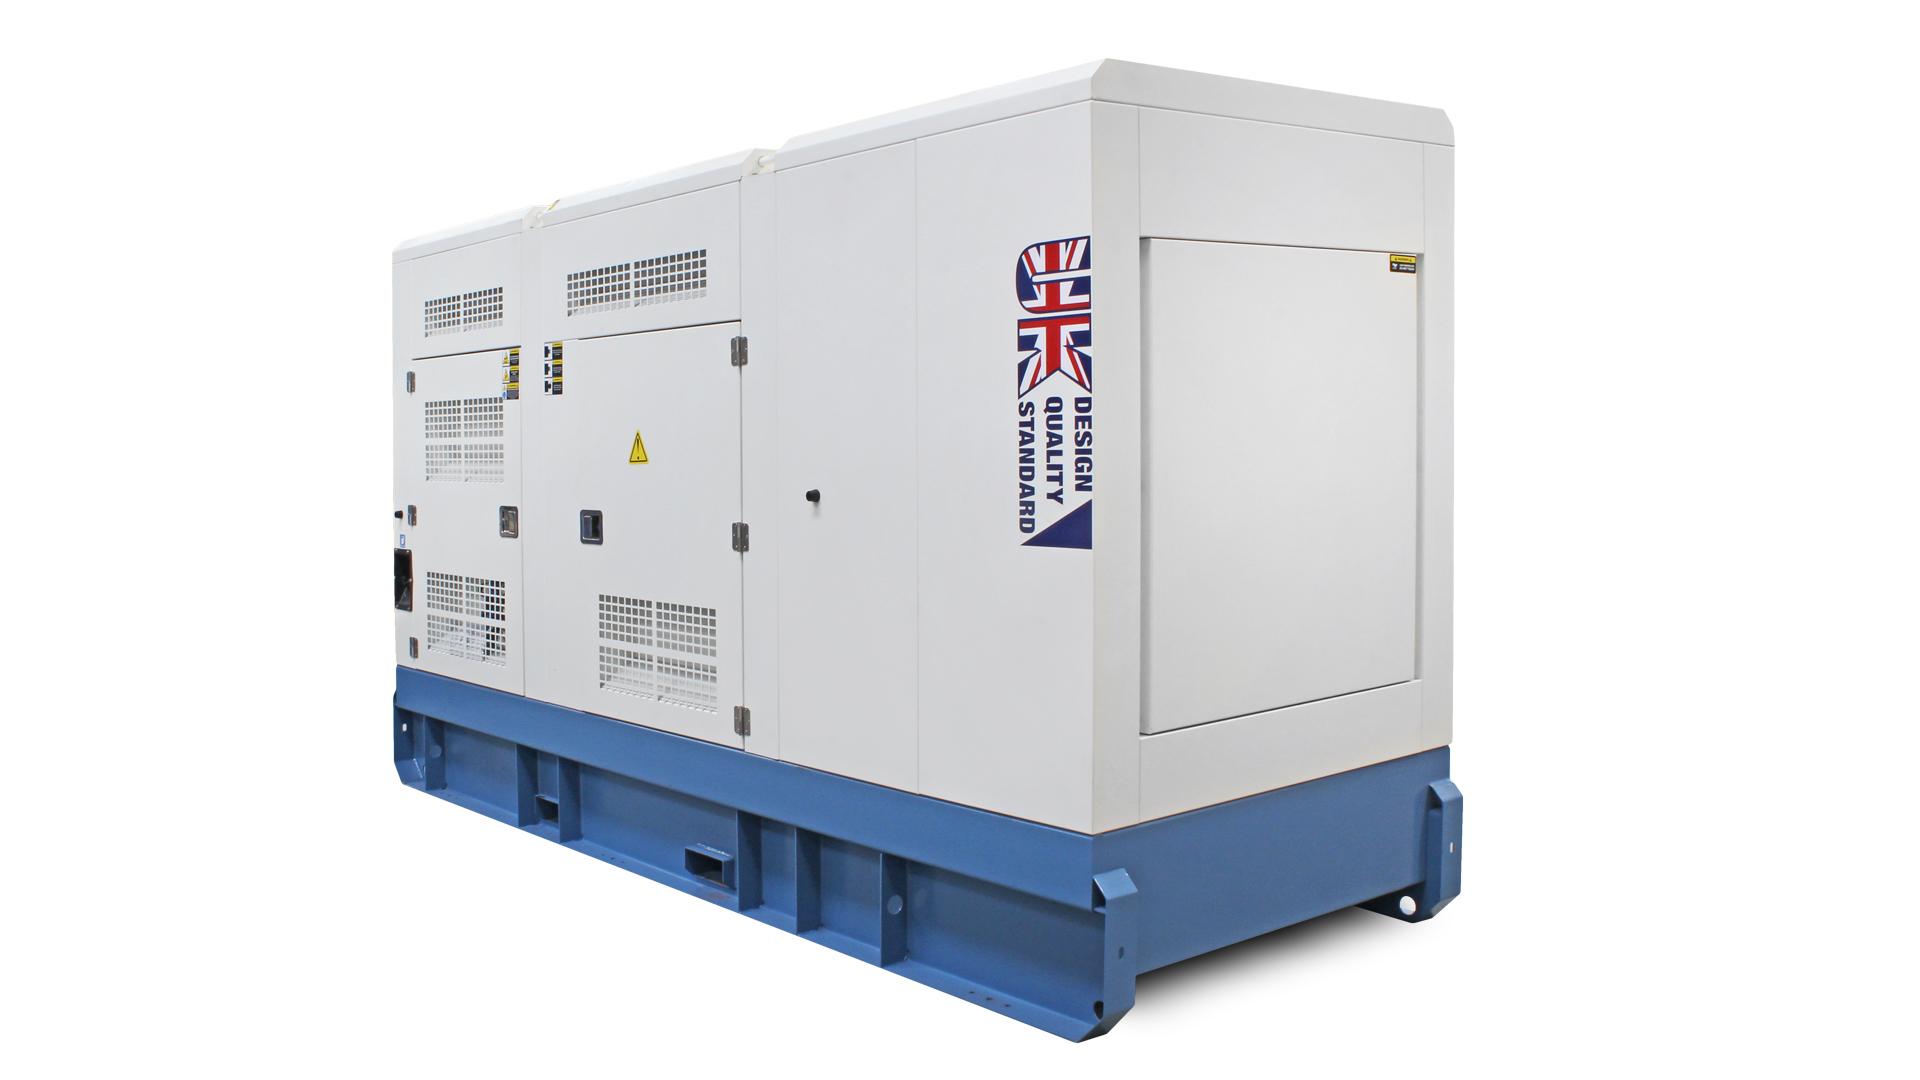 UKC360ECO Cummins Generator Rear Image